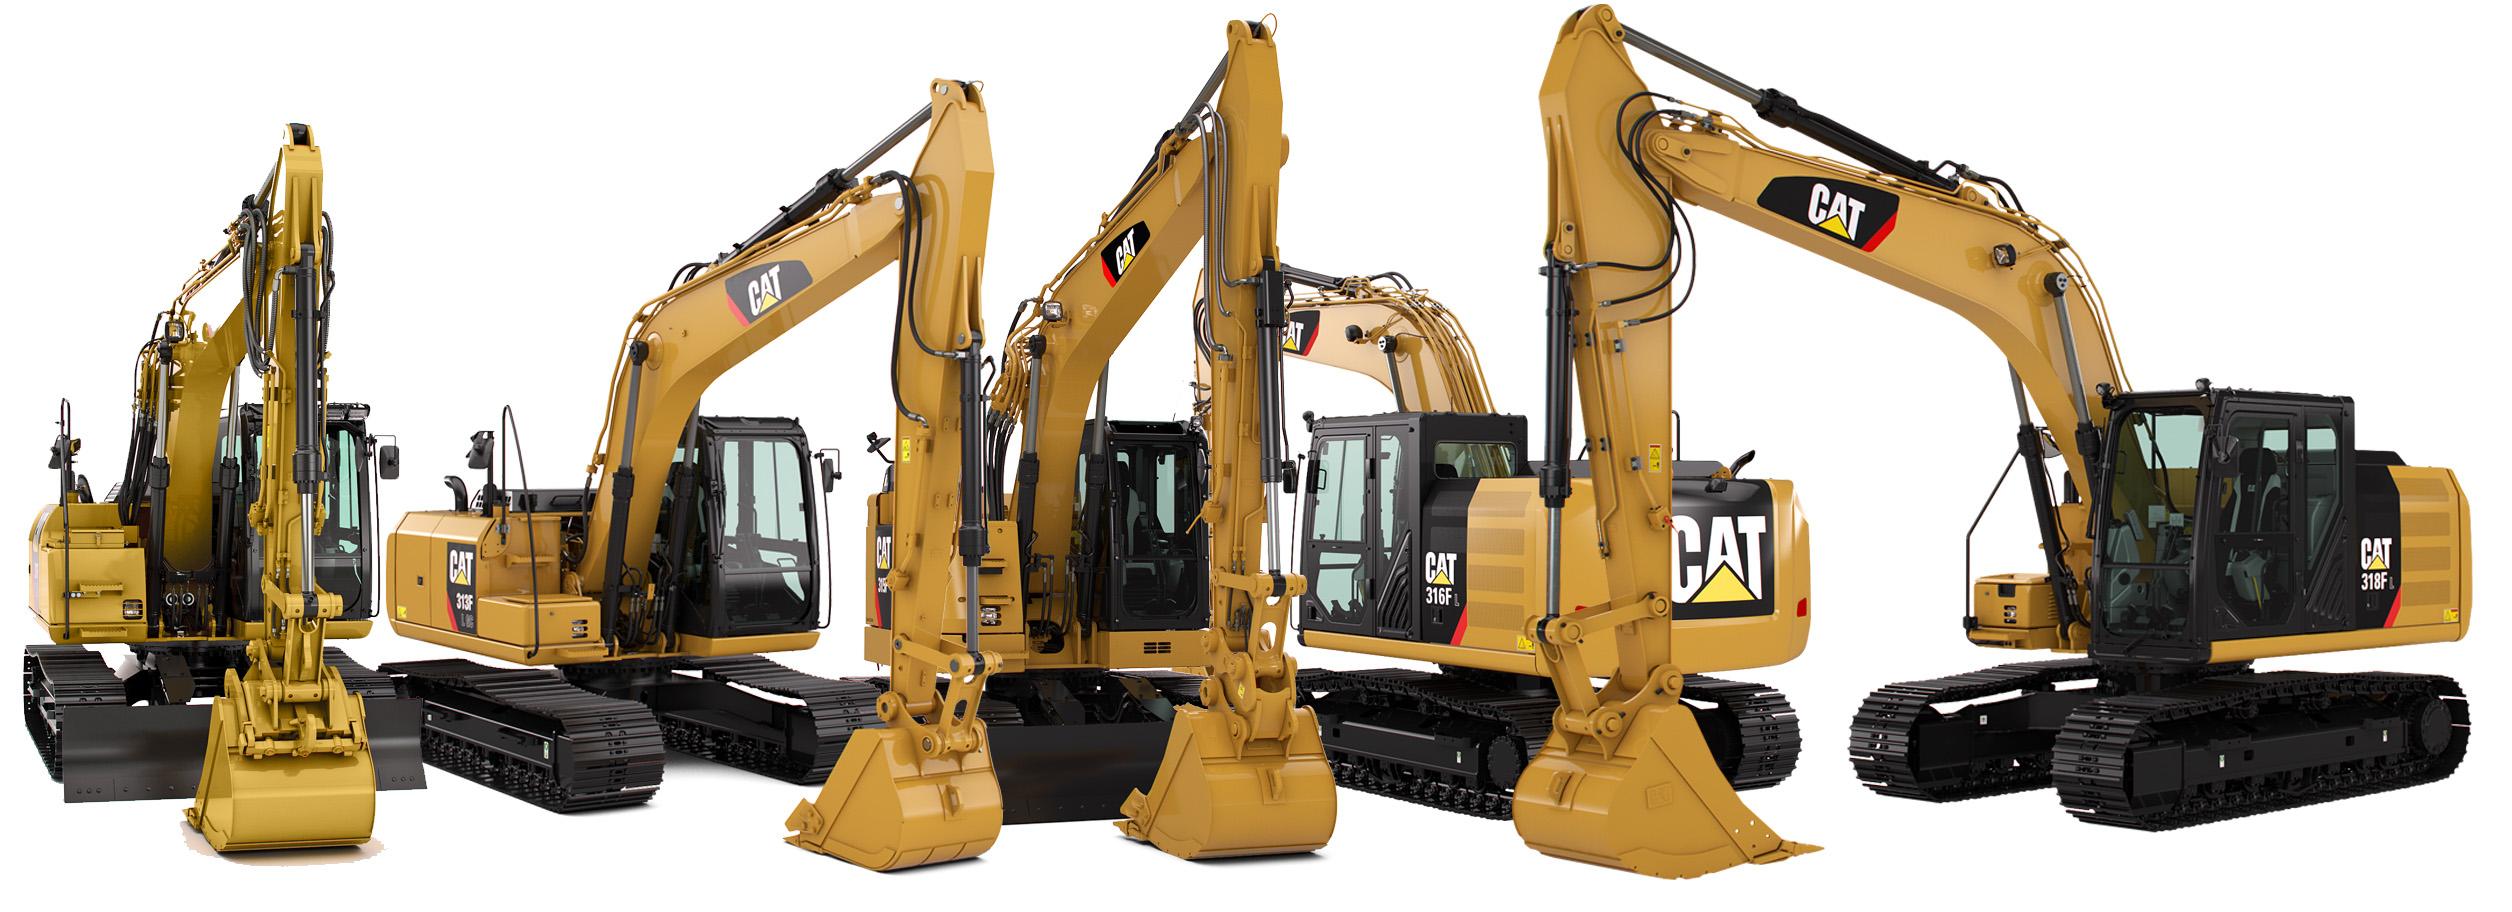 Small-Excavator-Promotion-v3